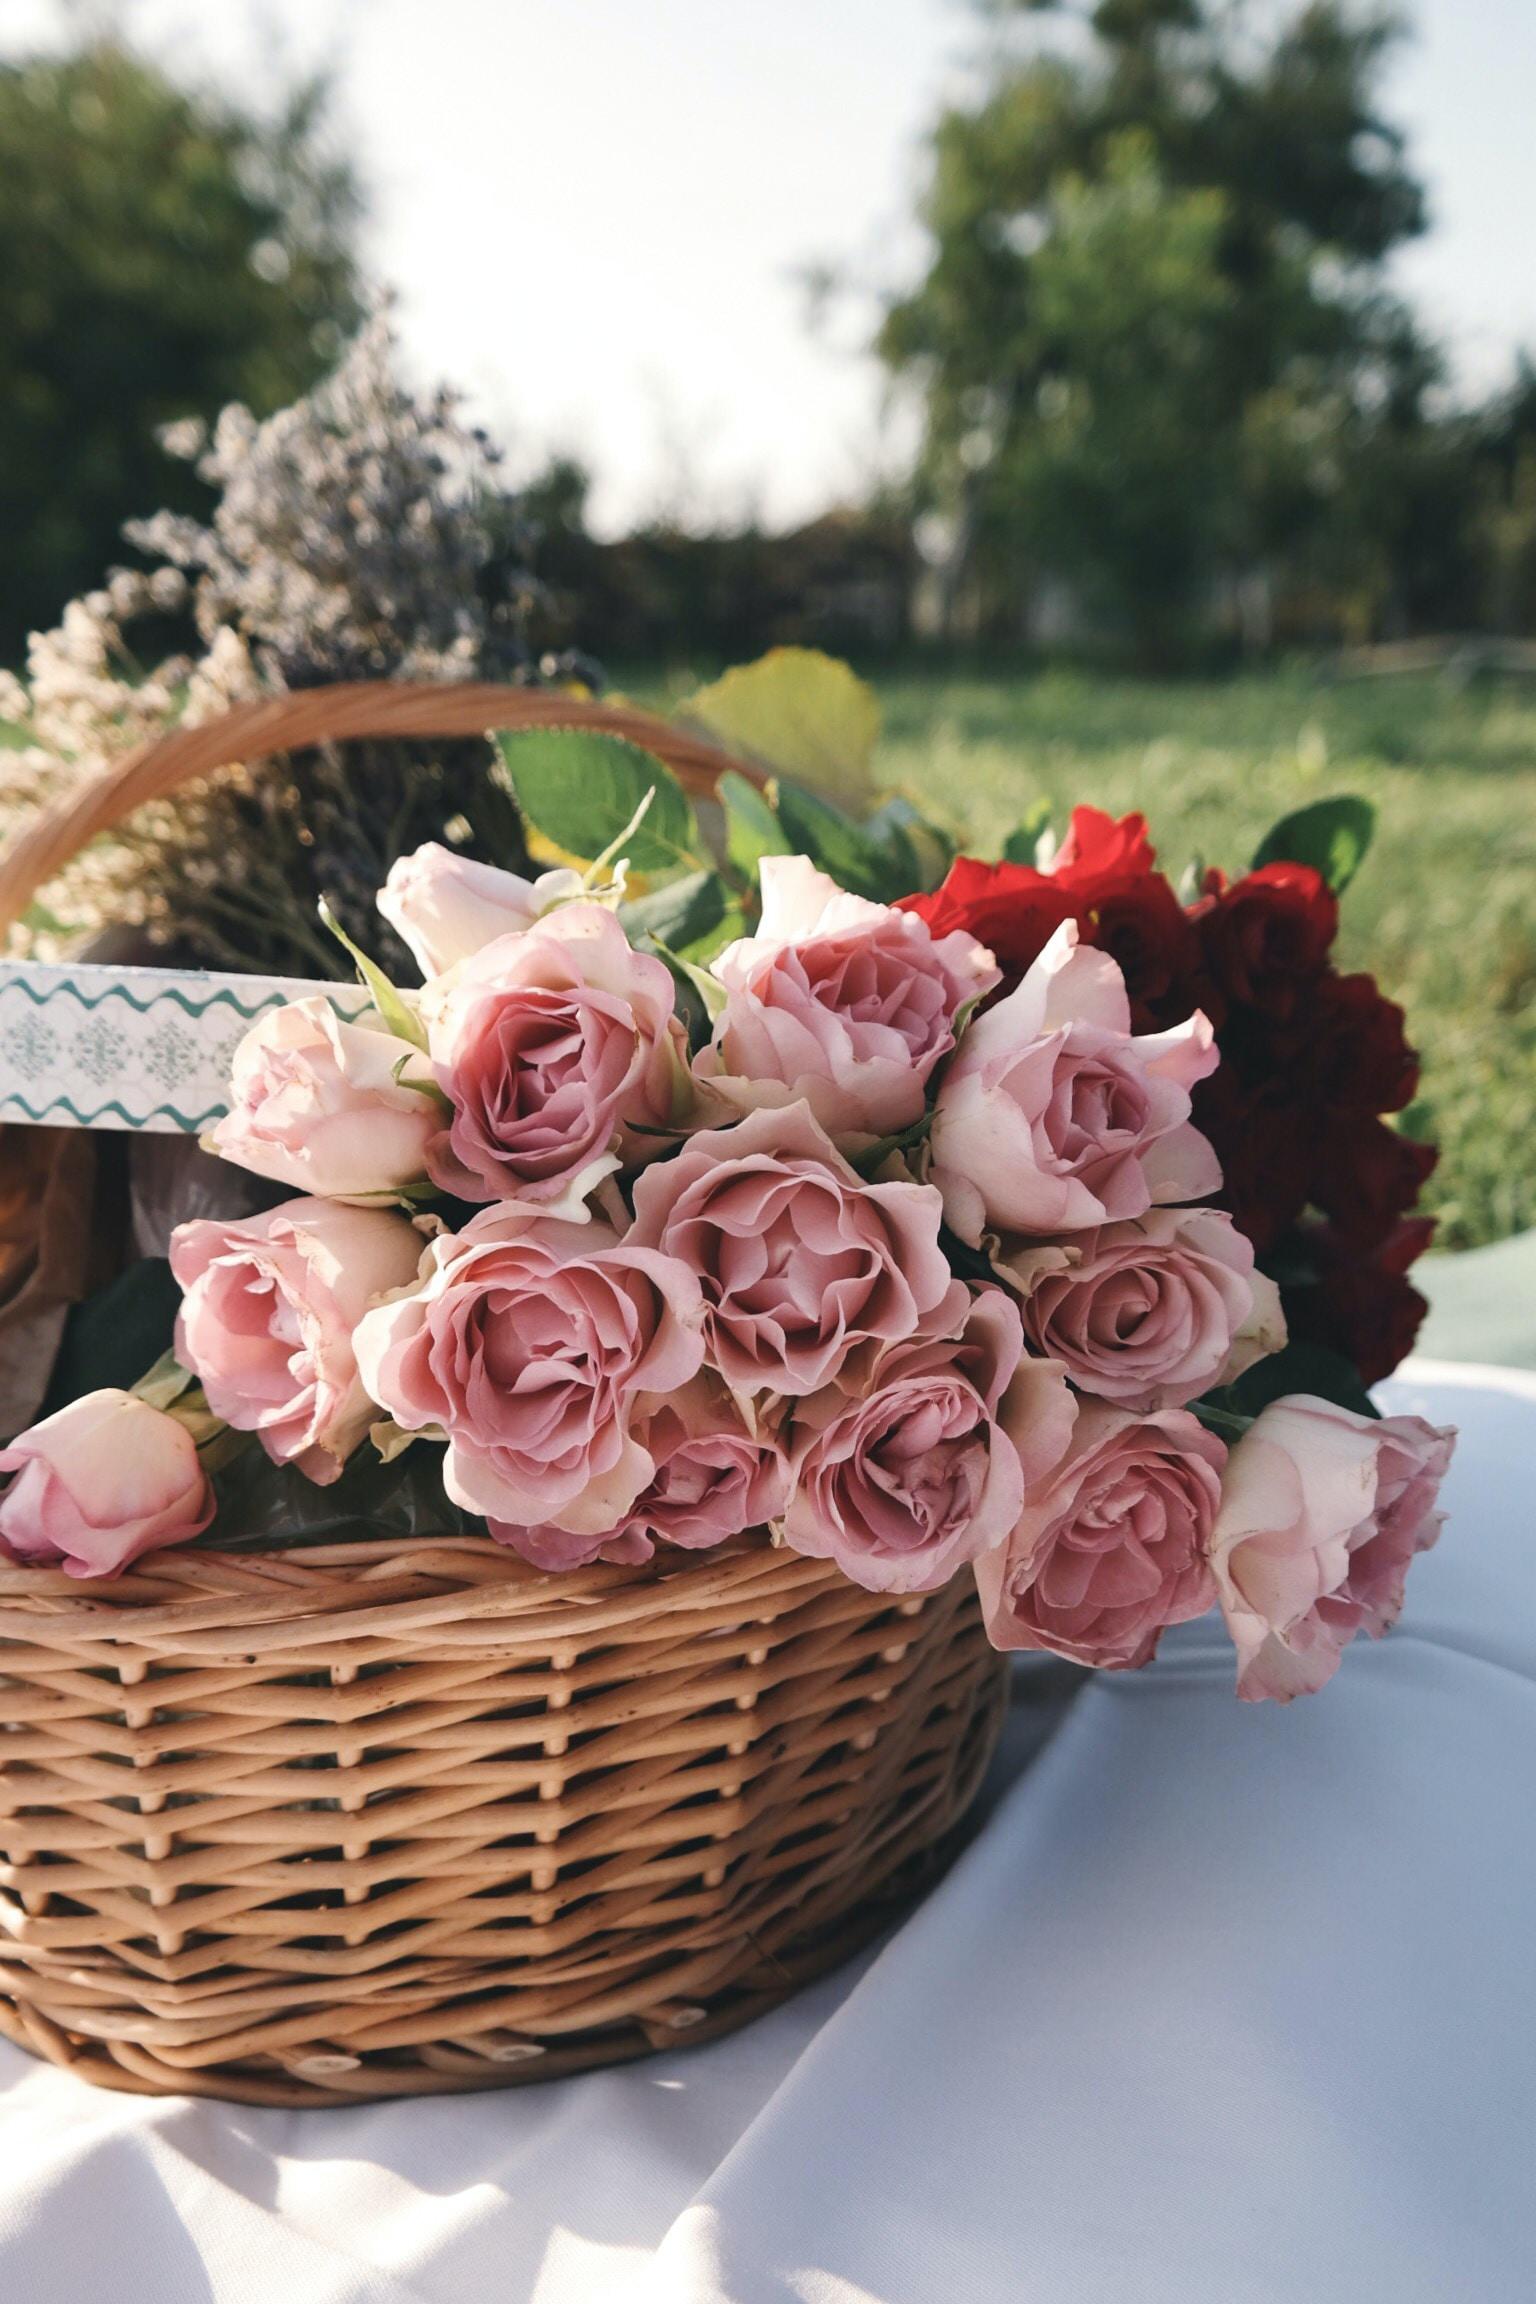 Pink roses sitting inside a brown wicker basket.